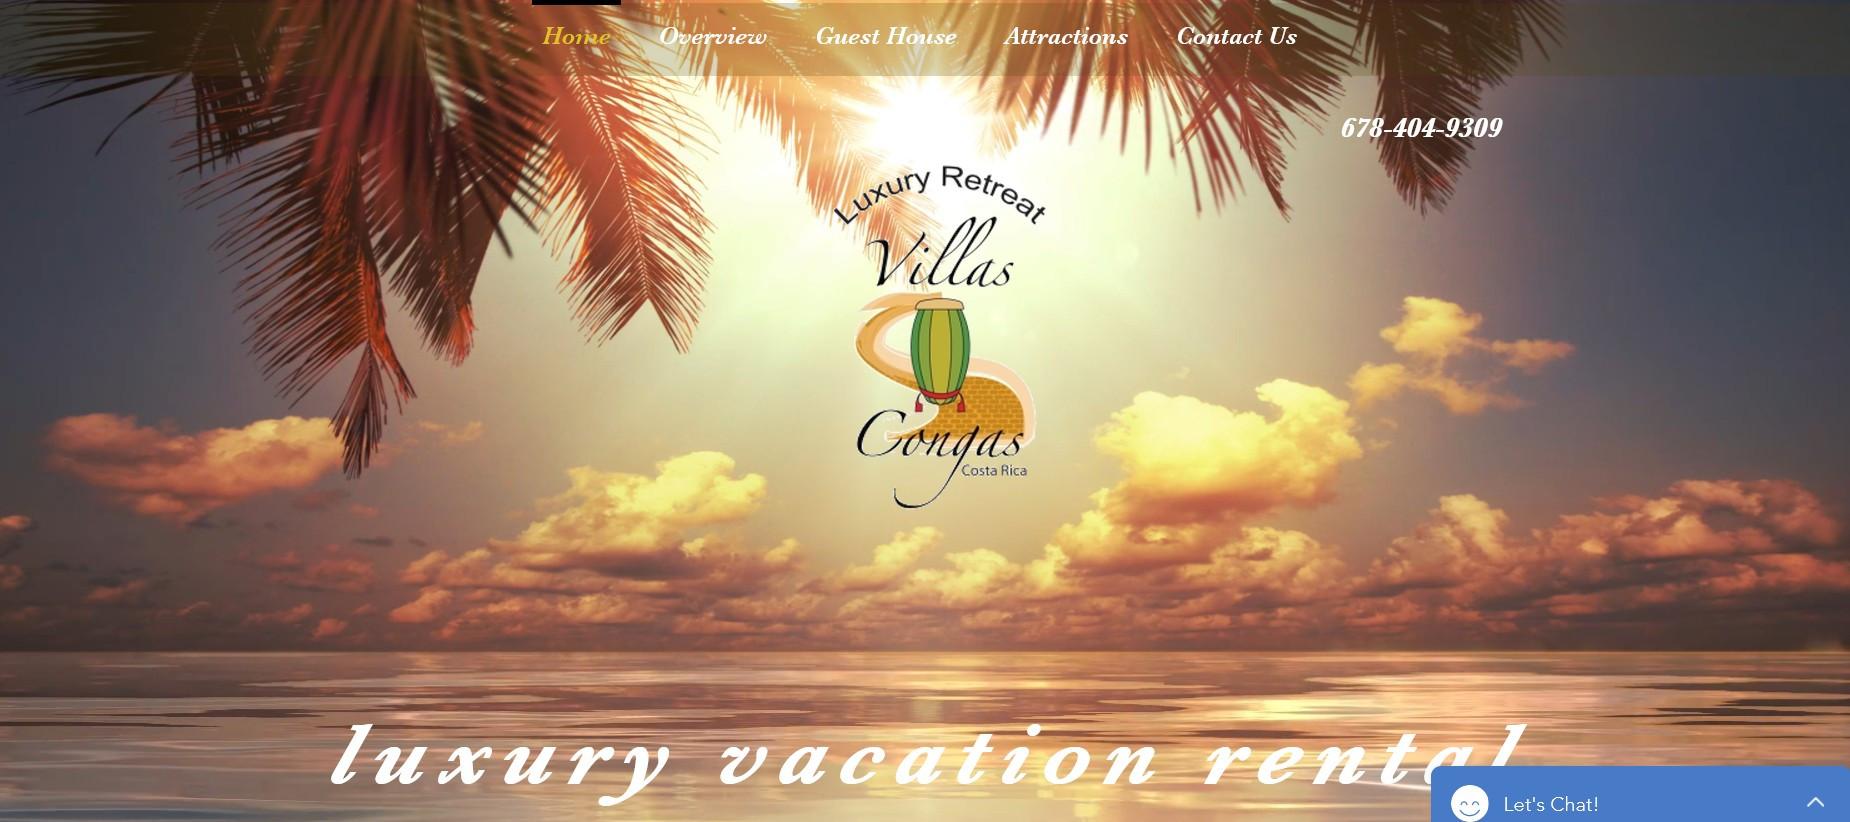 Villas Congas- Costa Rica Luxury Retreat